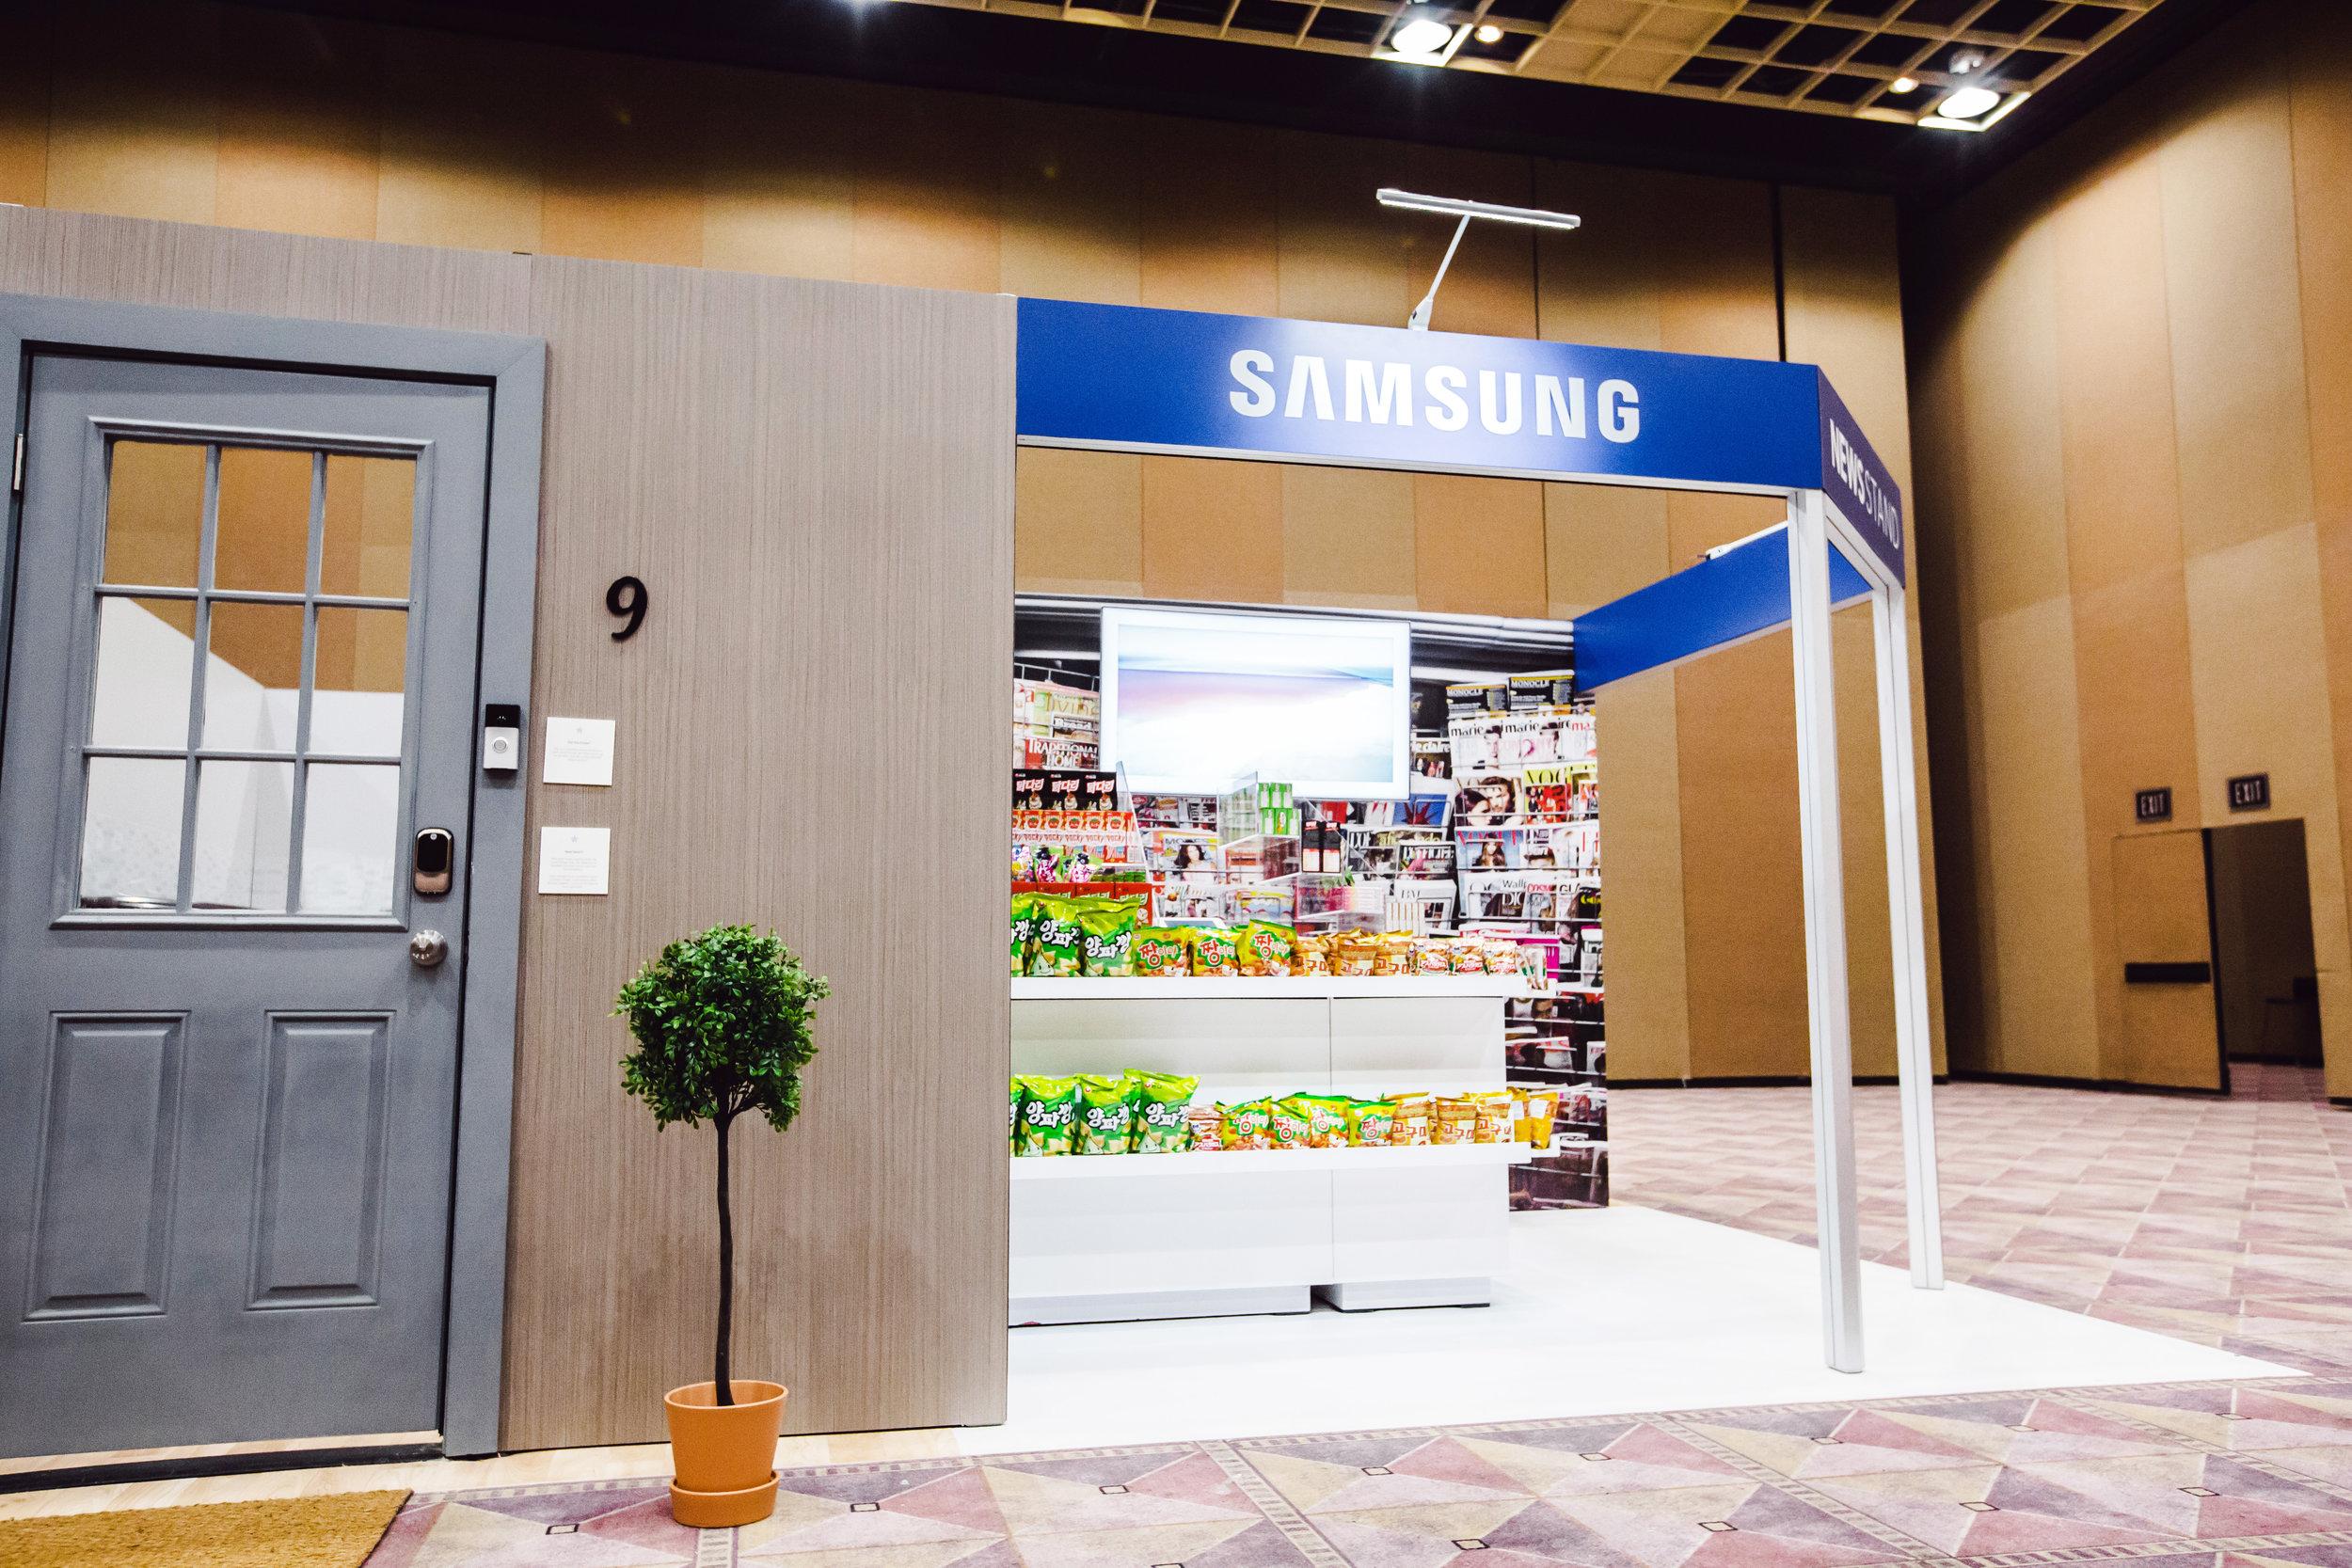 WorkImagery_SamsungSvcs2.jpg